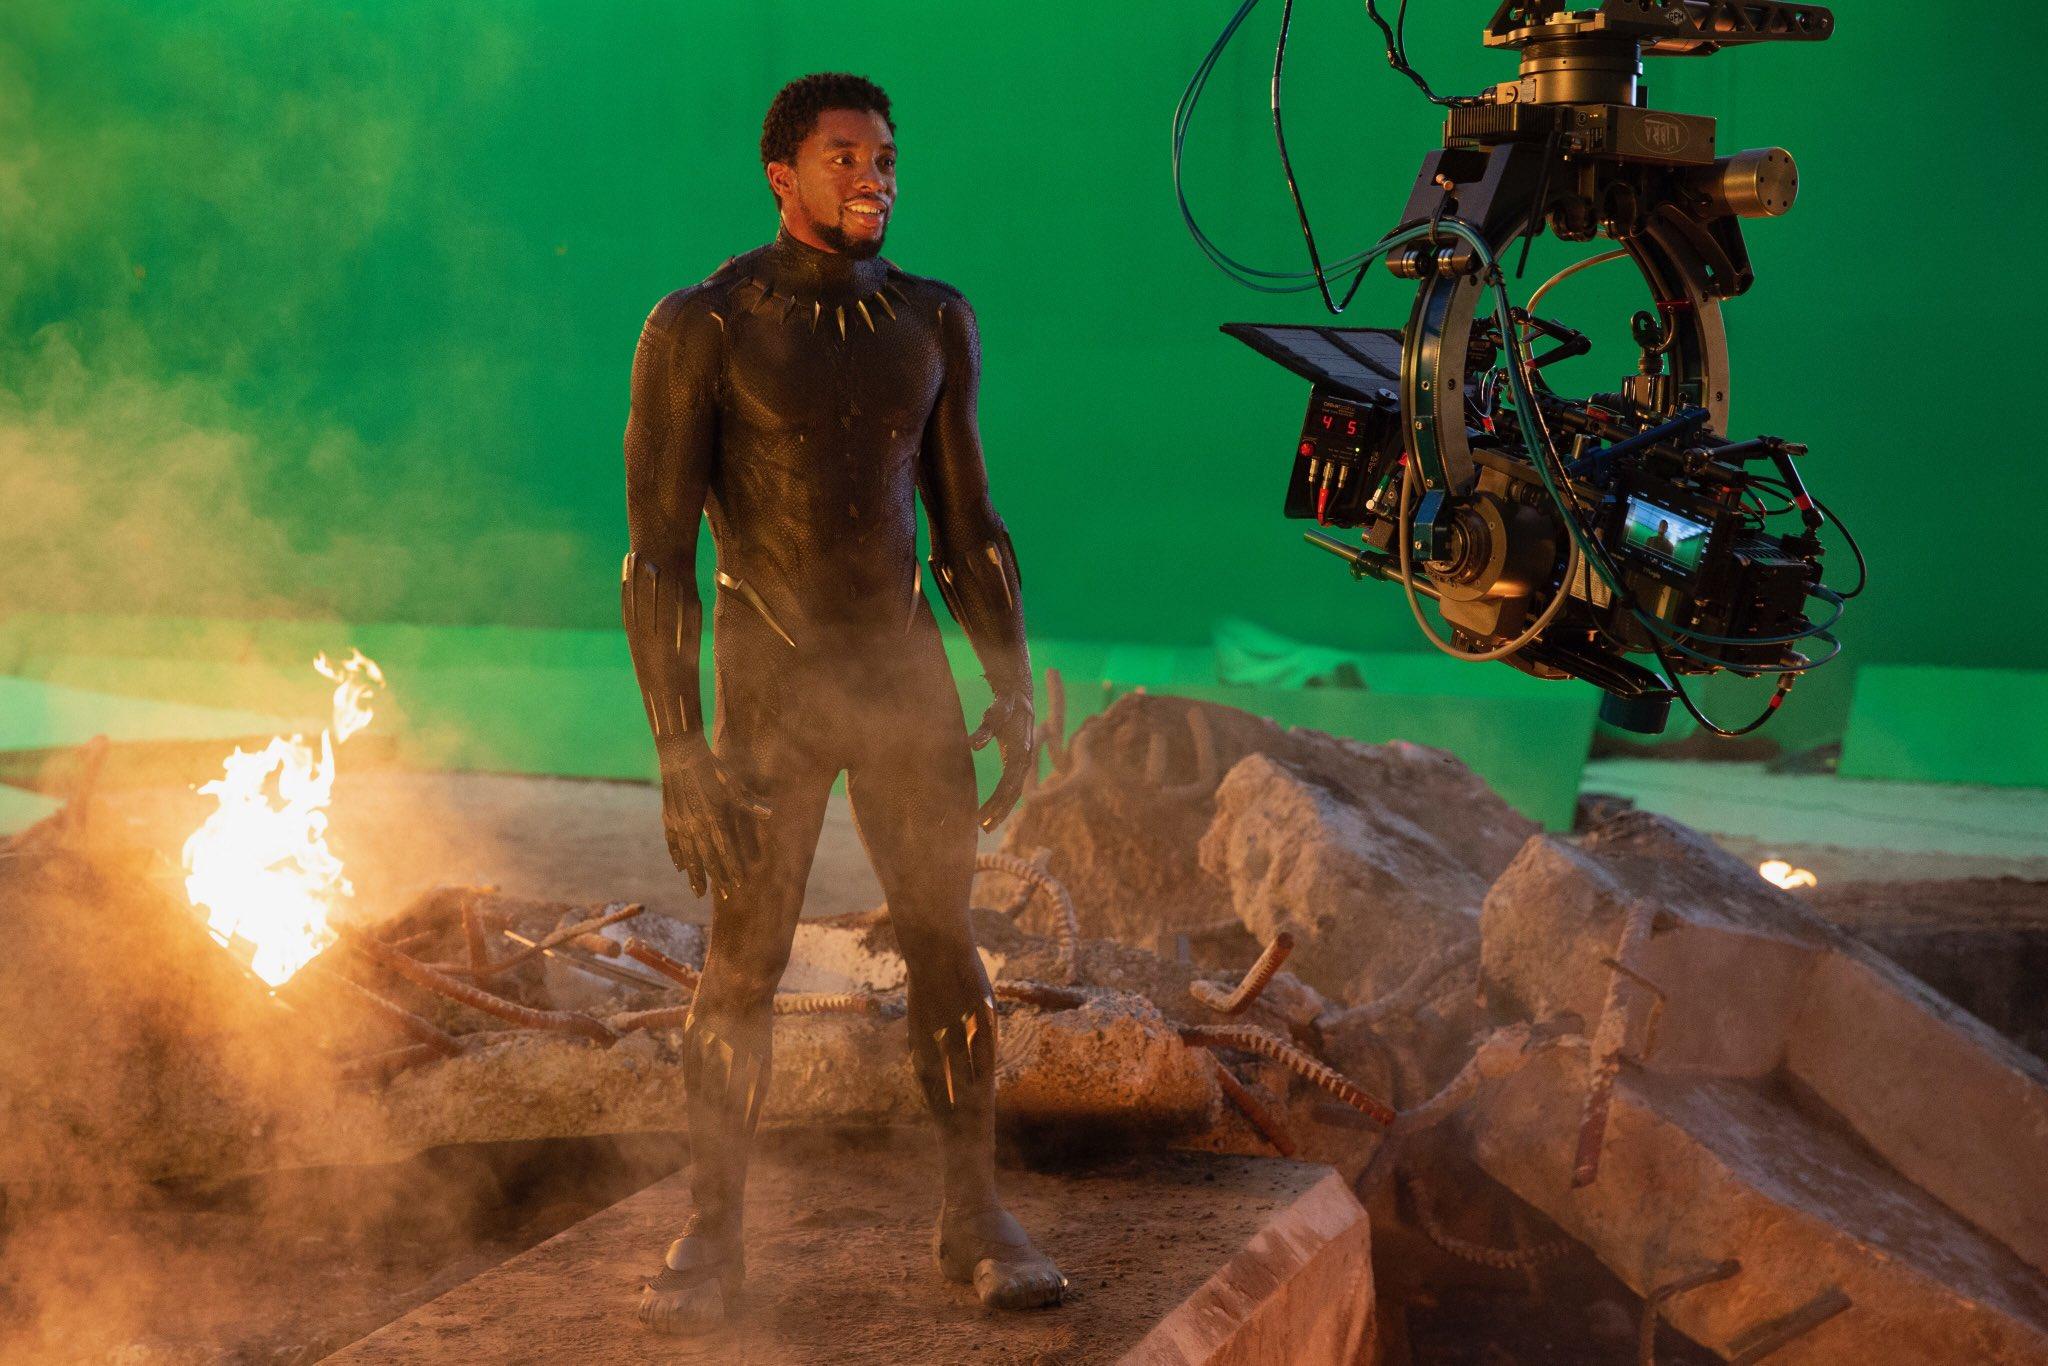 Chadwick Boseman on set of Avengers: Endgame